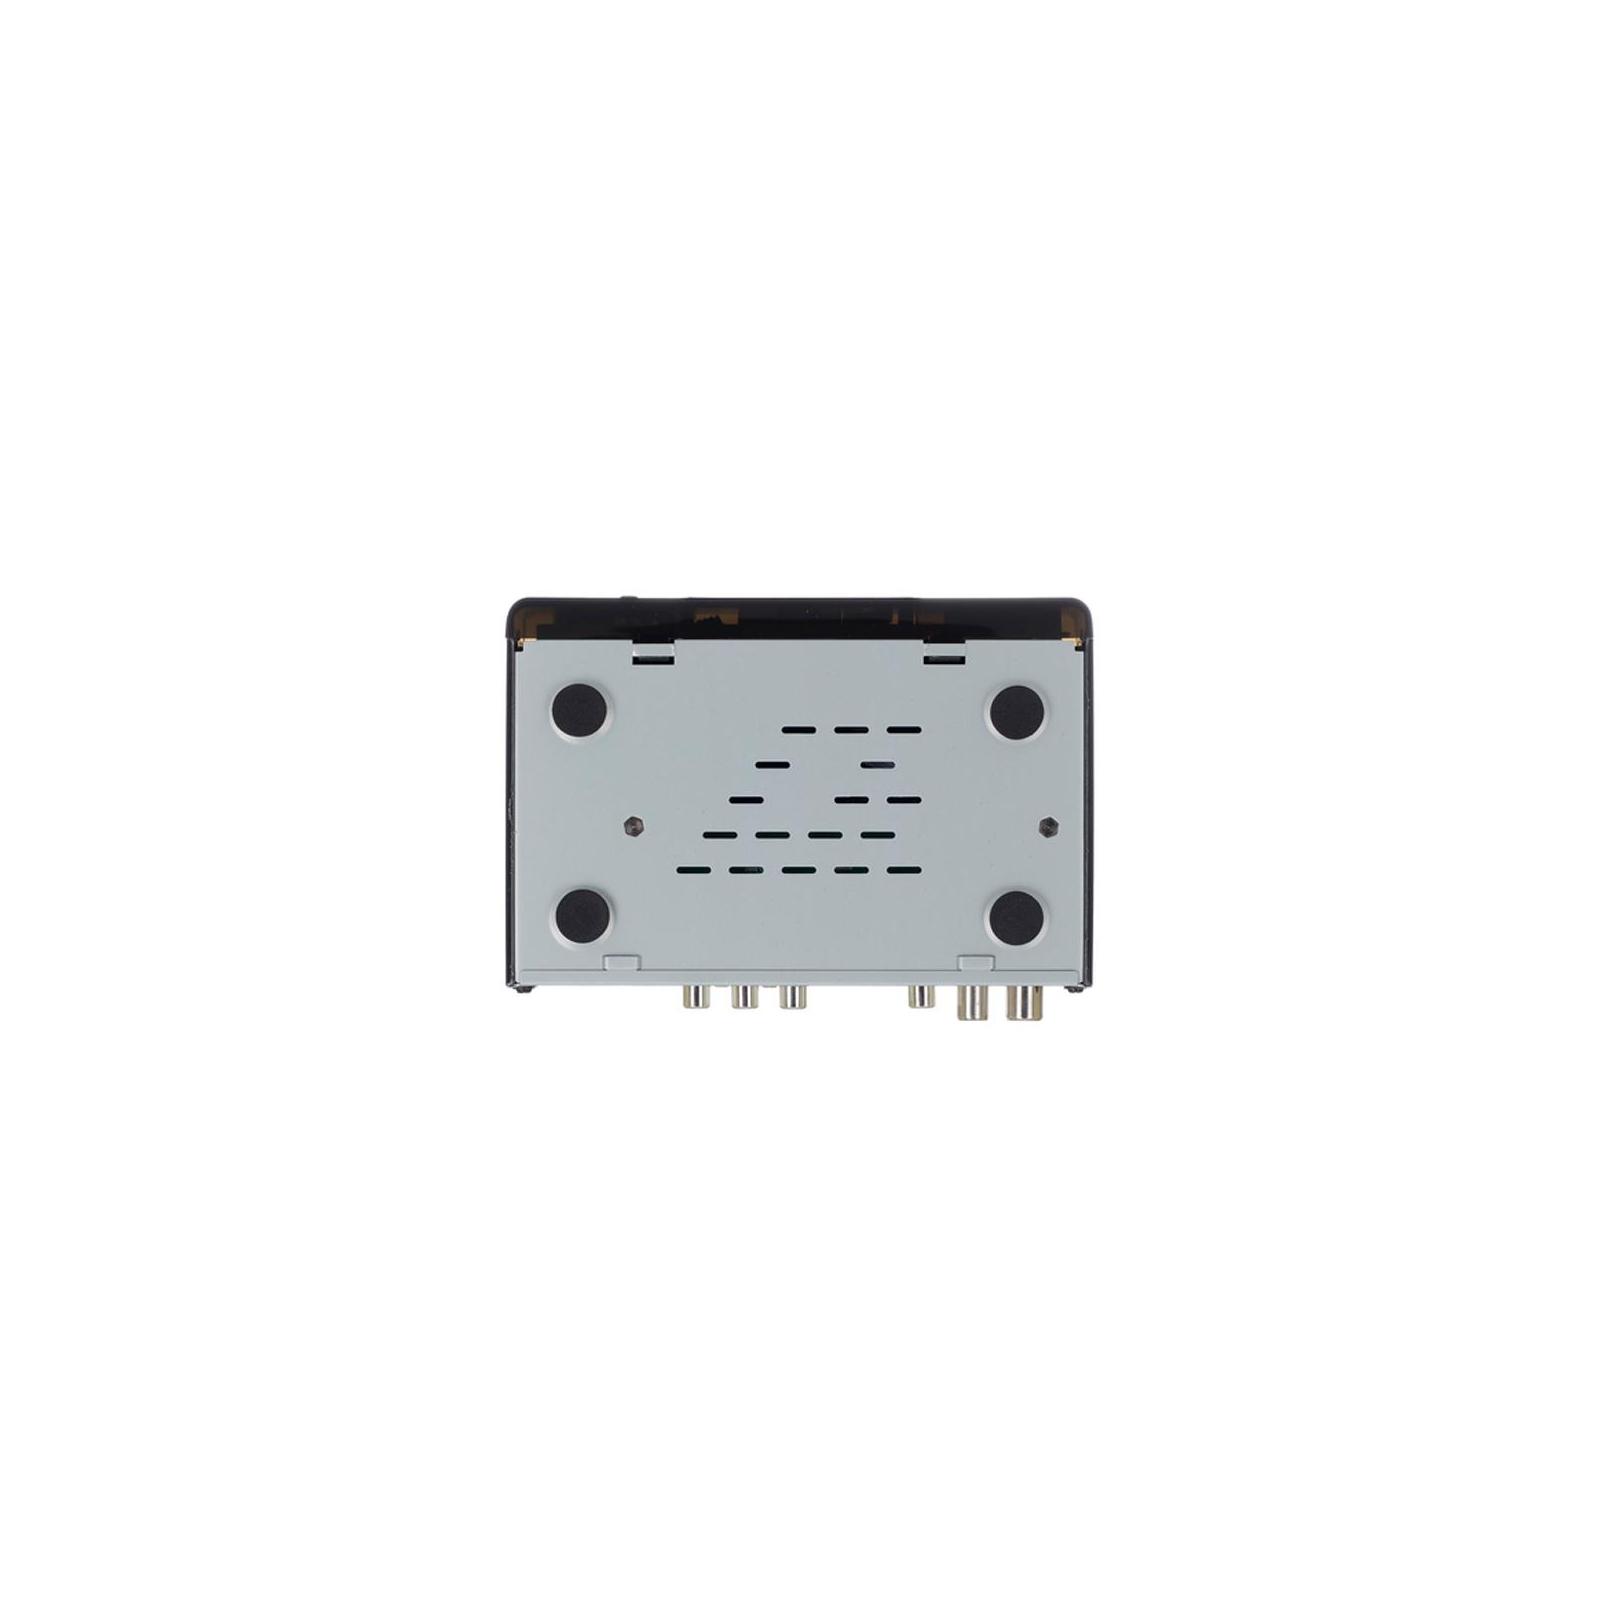 ТВ тюнер Ergo 1638 (DVB-T, DVB-T2) (STB-1638) зображення 6